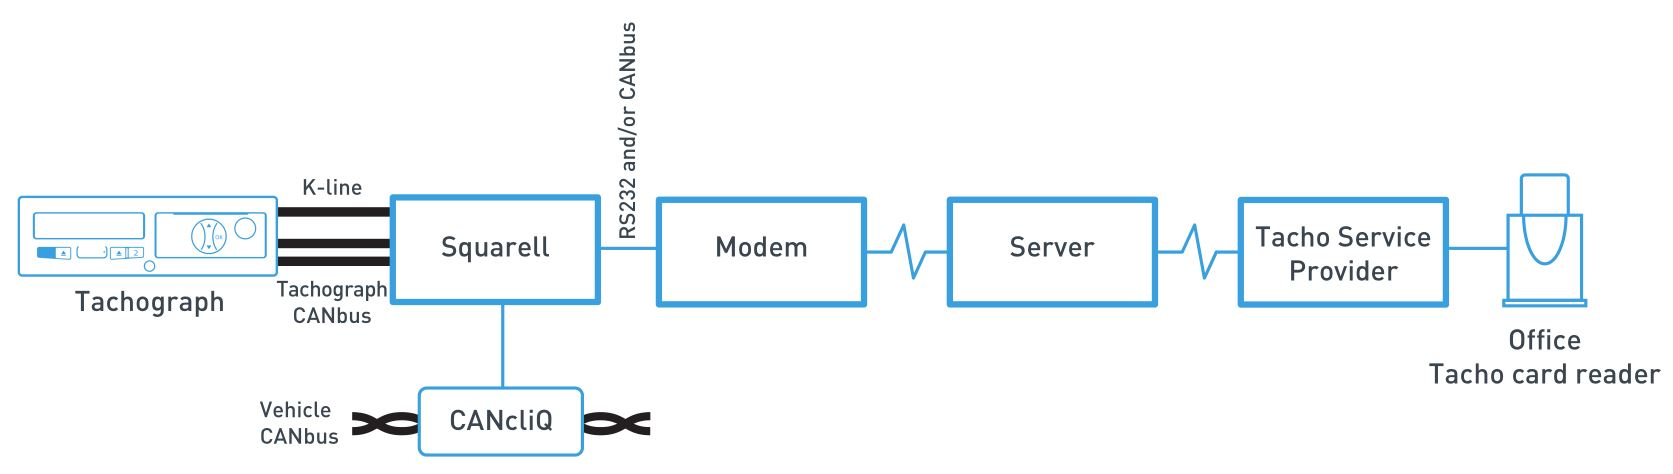 Vdo Tachometers Wiring Diagram – Vdo Wiring Diagram